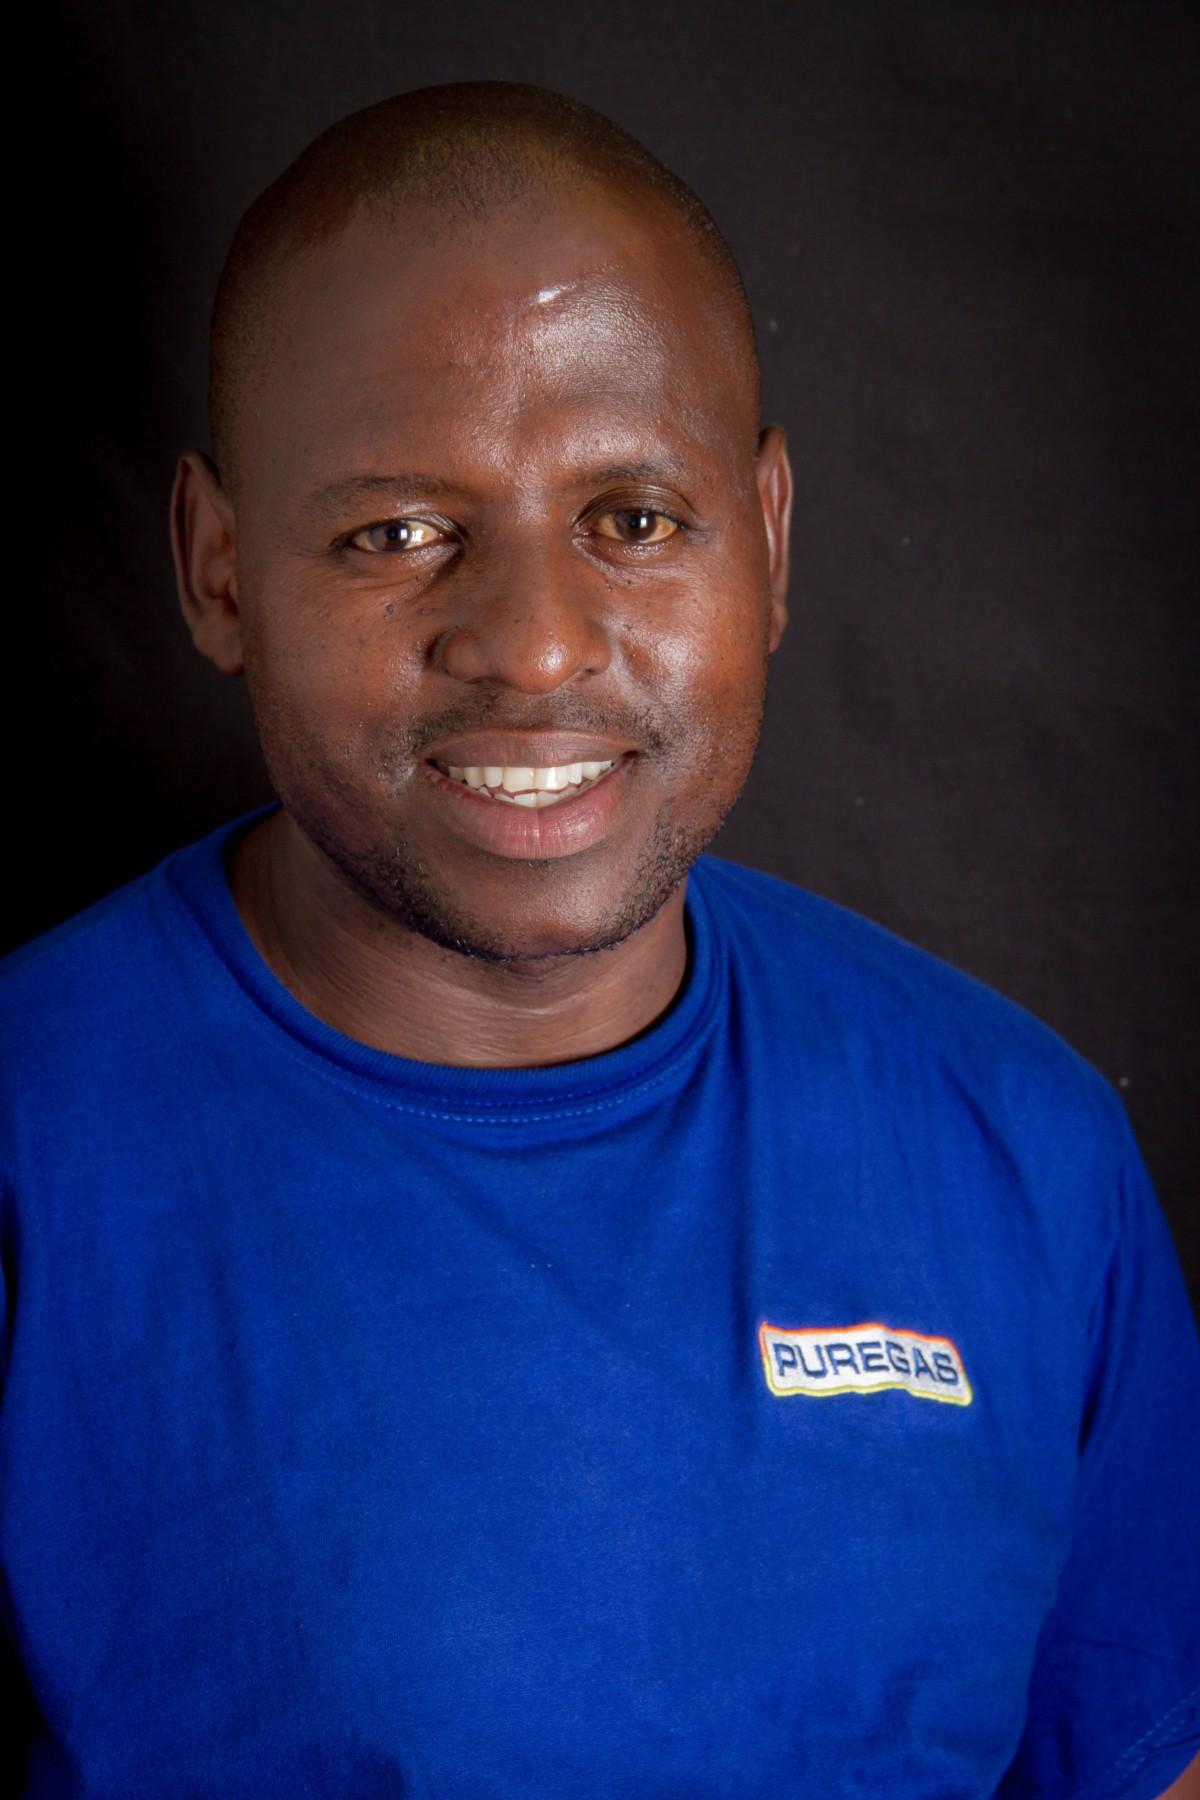 Puregas Staff memeber - Vusi Mzisi